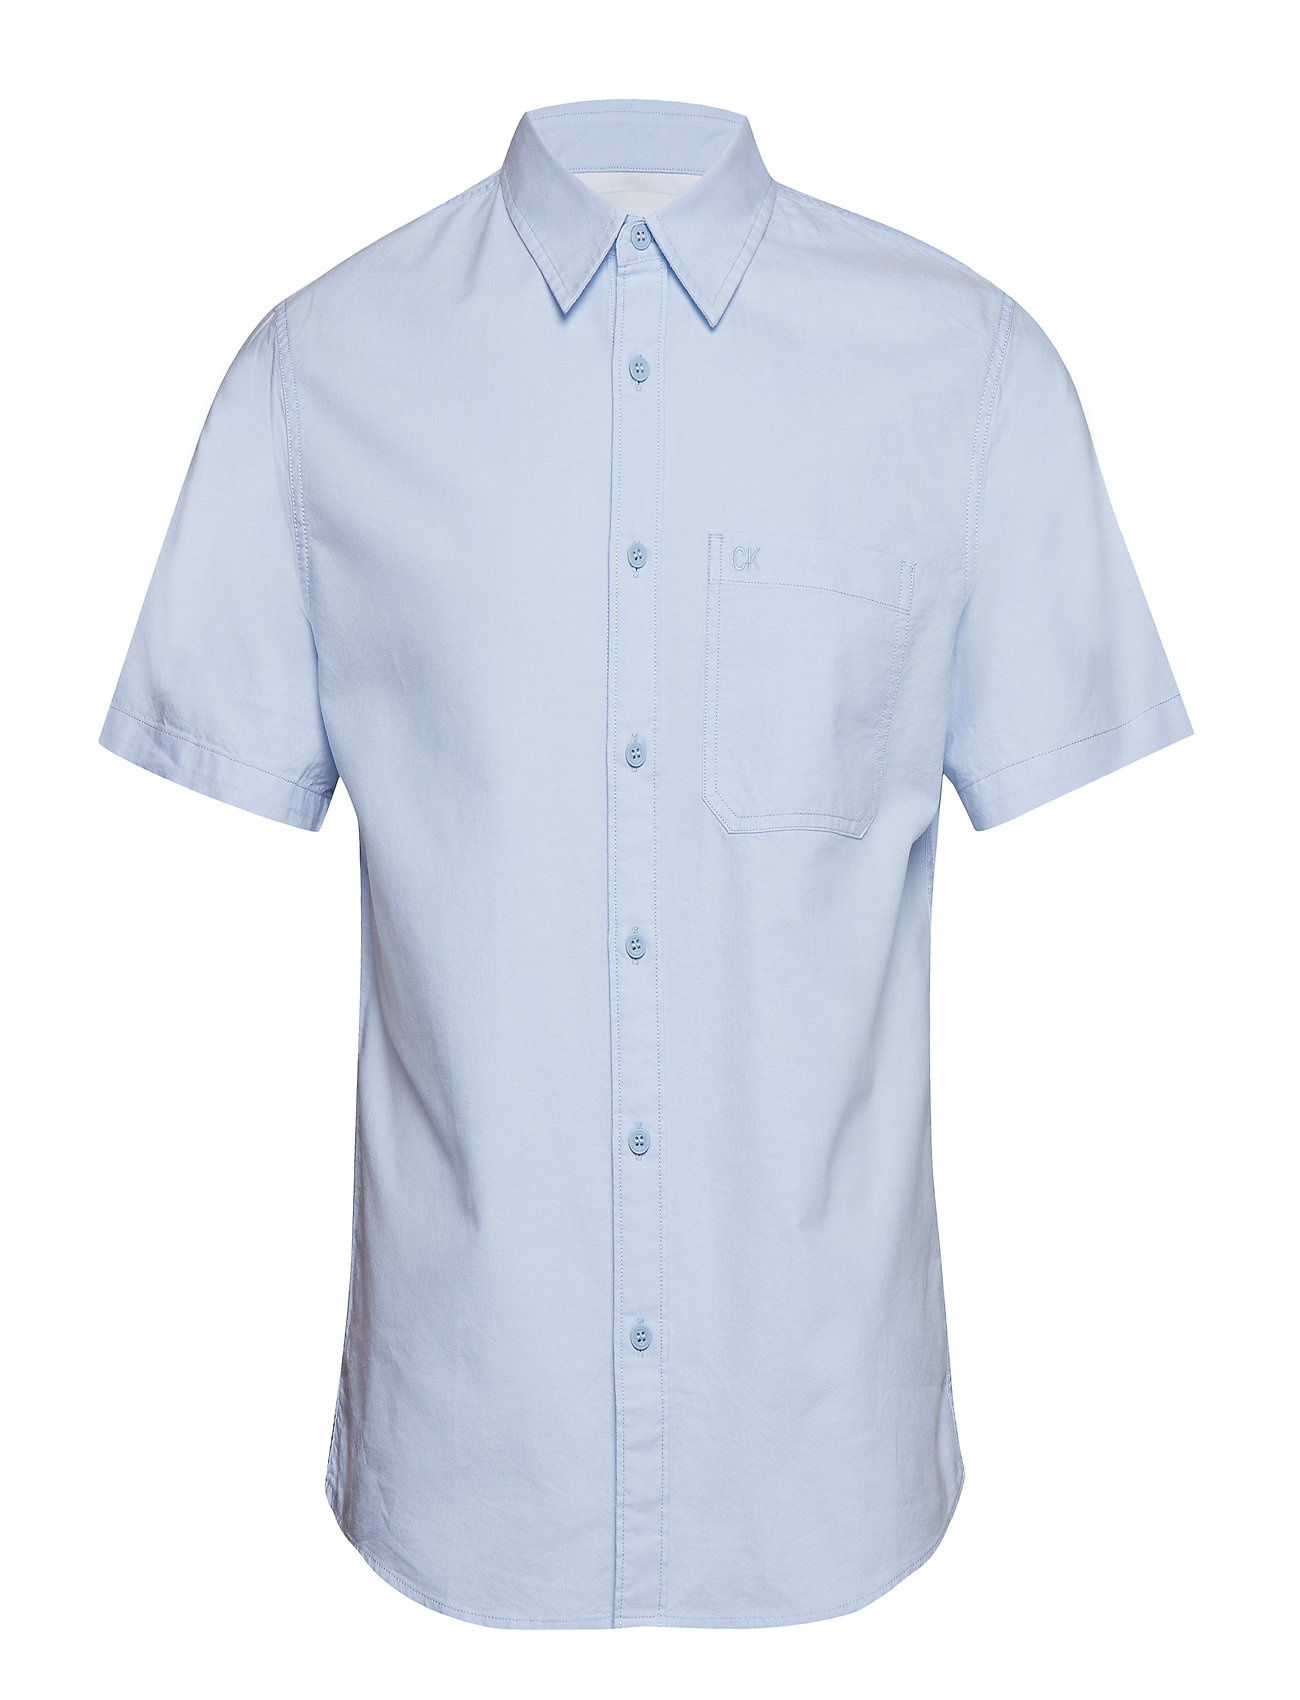 Non Klein Oxford Jeans Reg Stretch Sschambray BlueCalvin Ckj 8nXwOPkN0